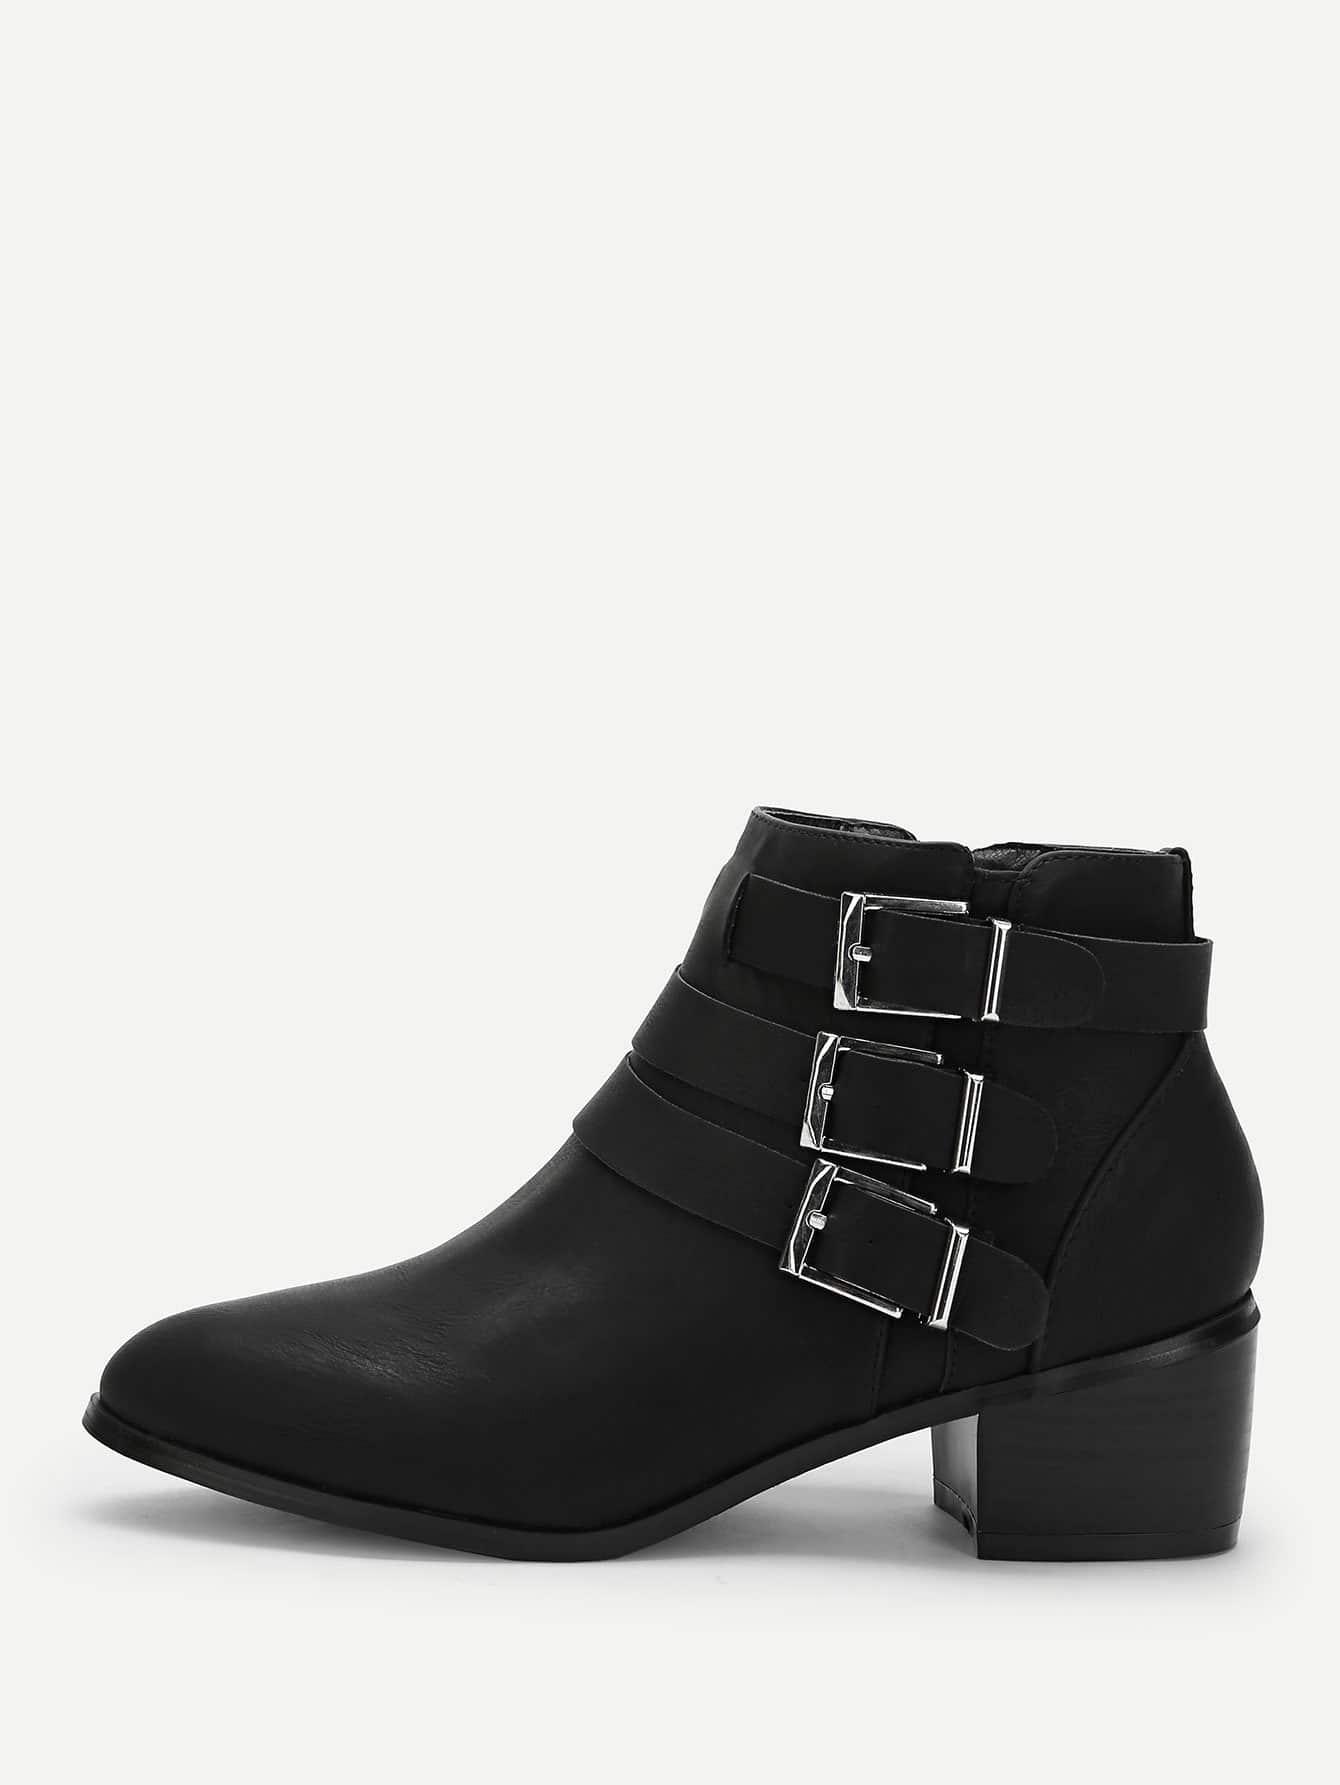 Фото - Короткие сапоги с застёжкой молния и пряжкой от SheIn черного цвета